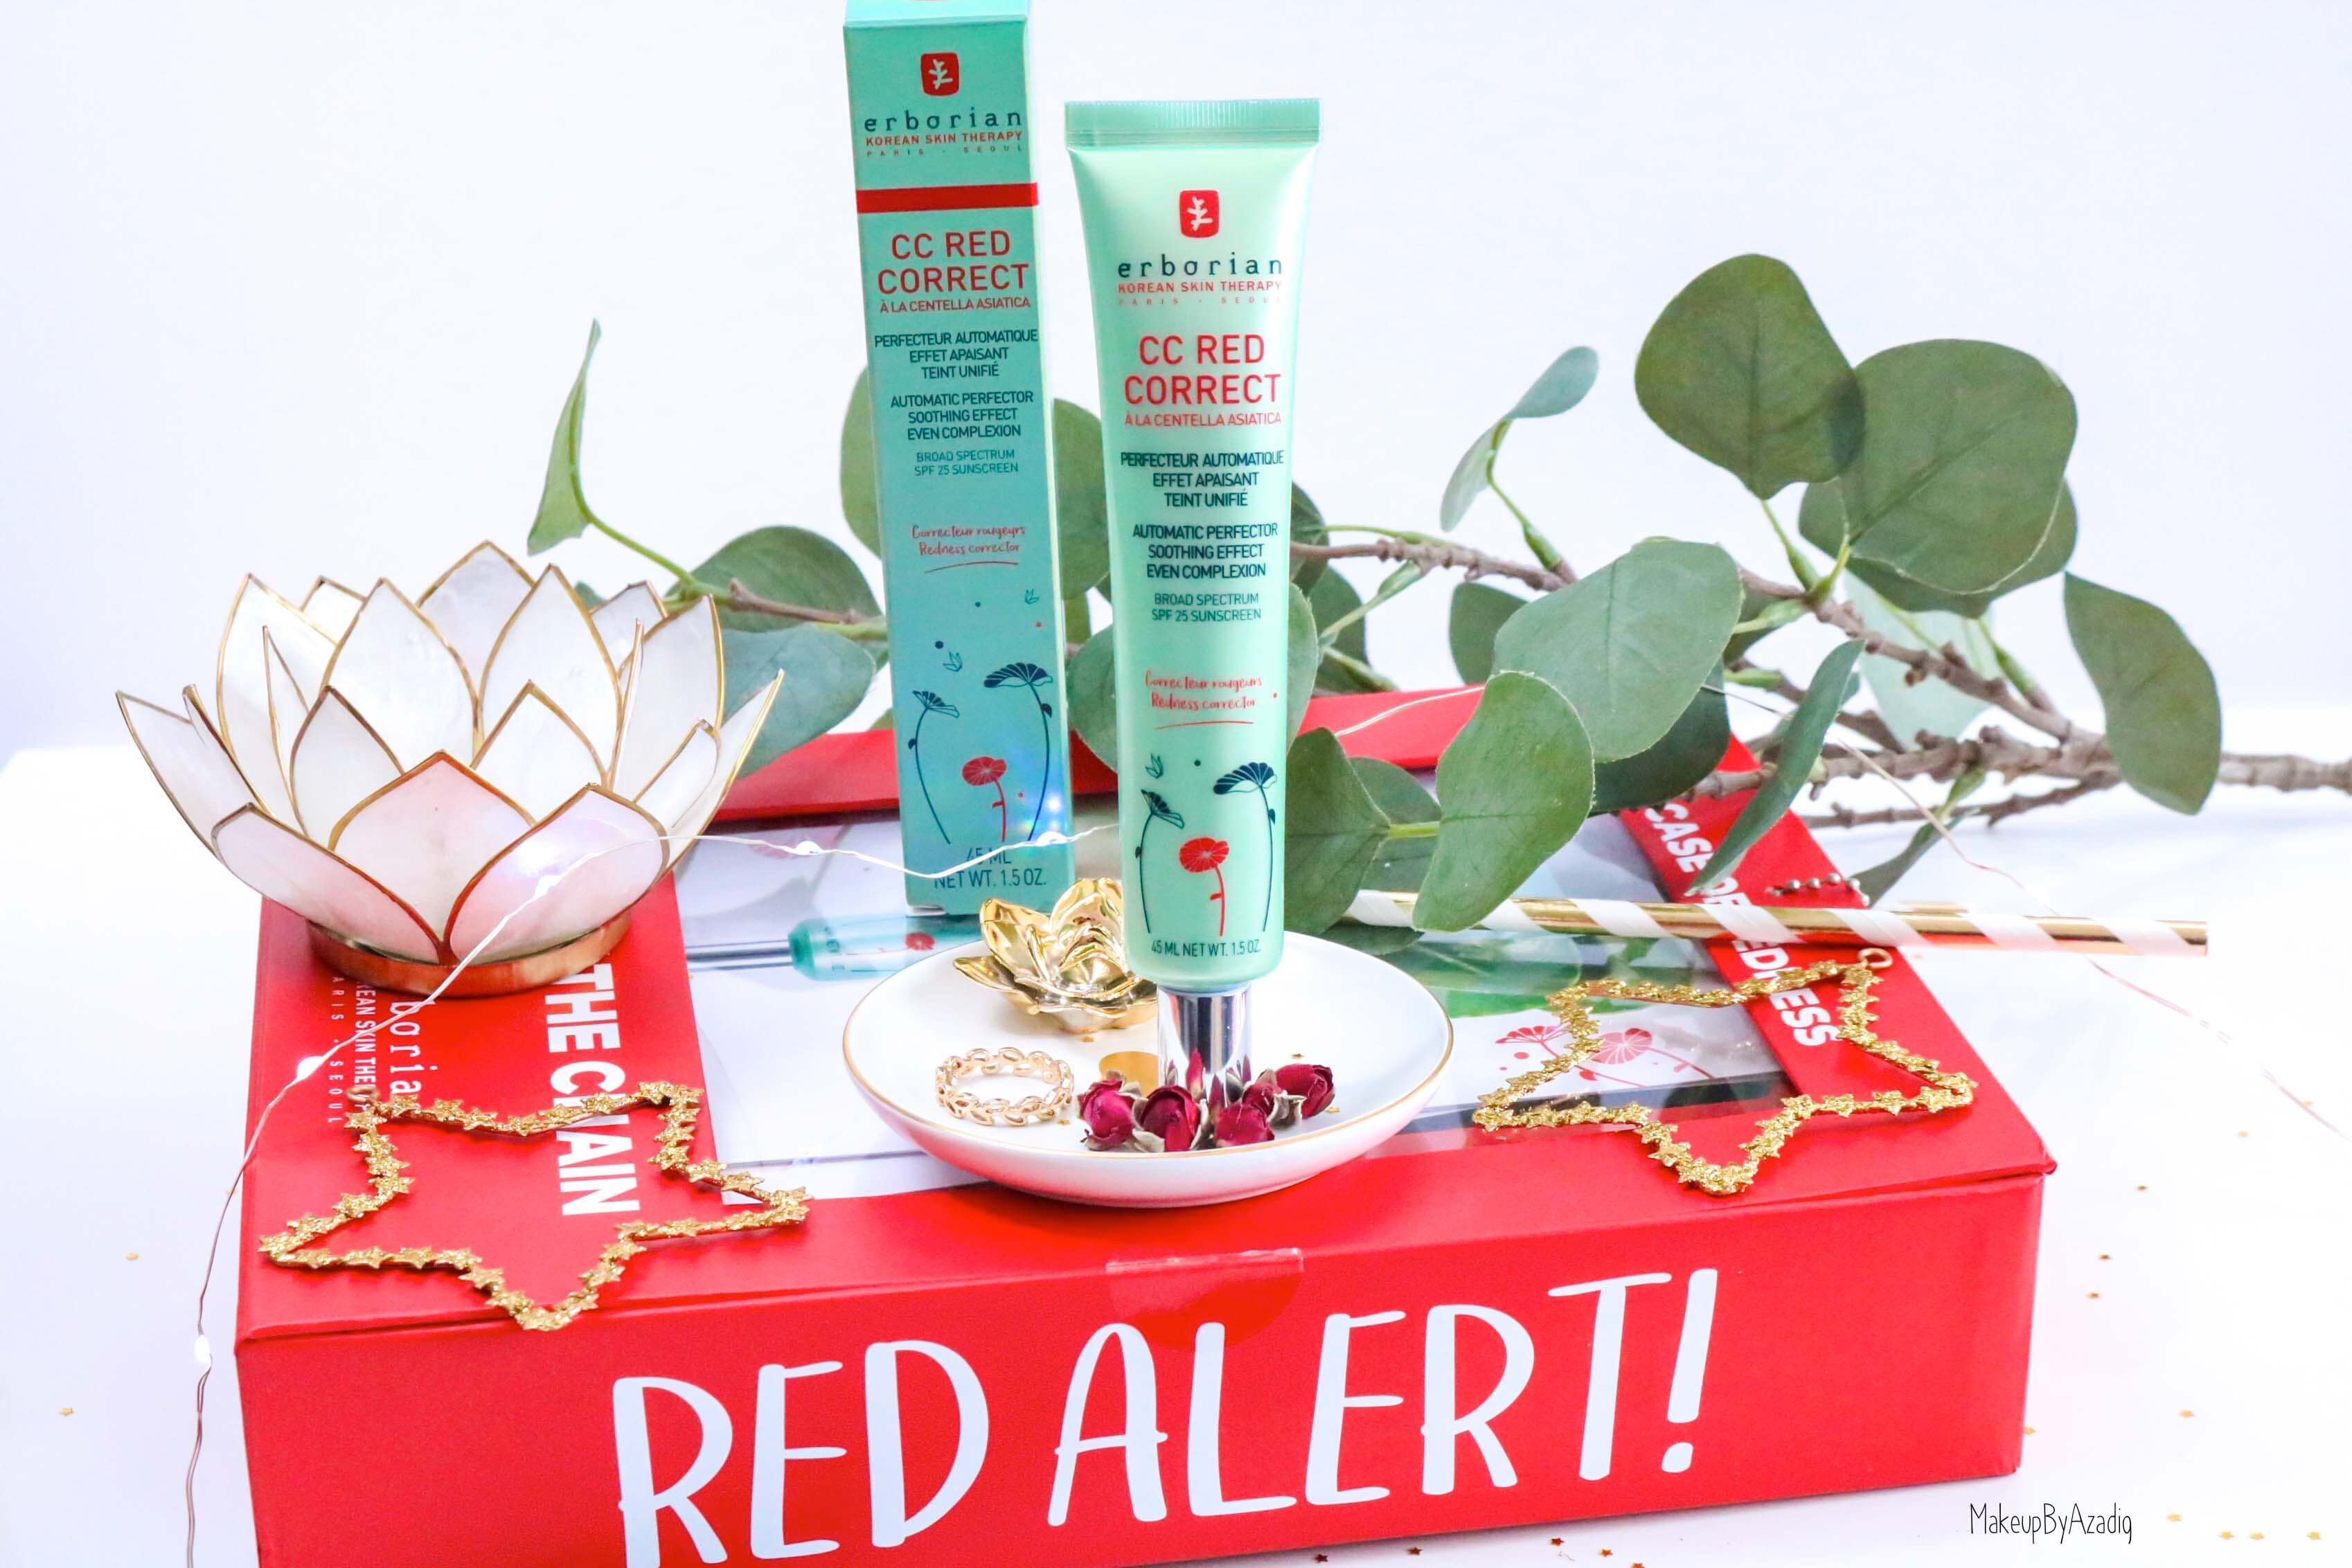 revue-nouveaute-erborian-cc-red-correct-correcteur-rougeurs-avis-prix-makeupbyazadig-partenariat